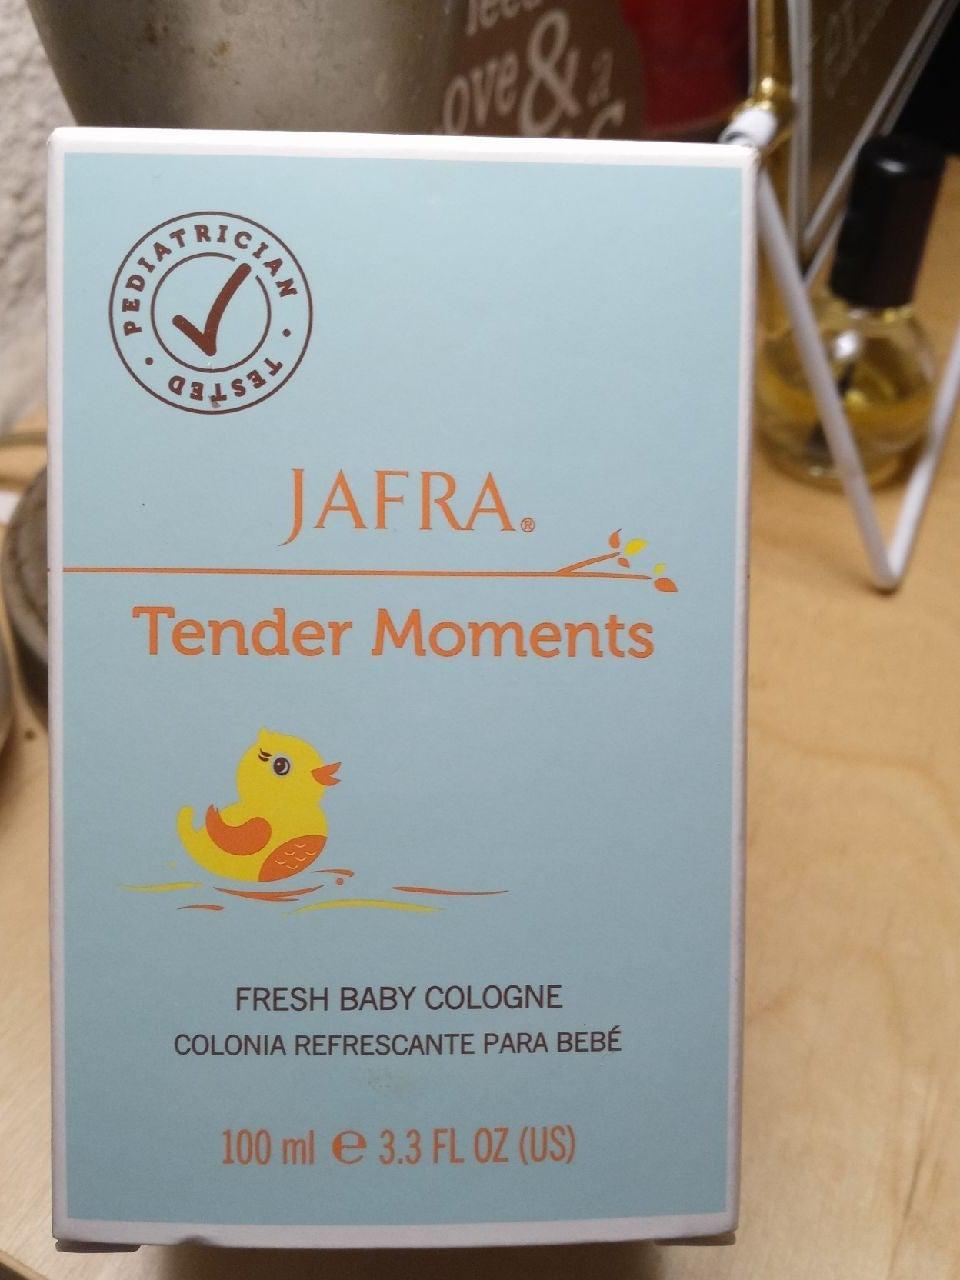 Jafra Tender Moments Baby Cologne